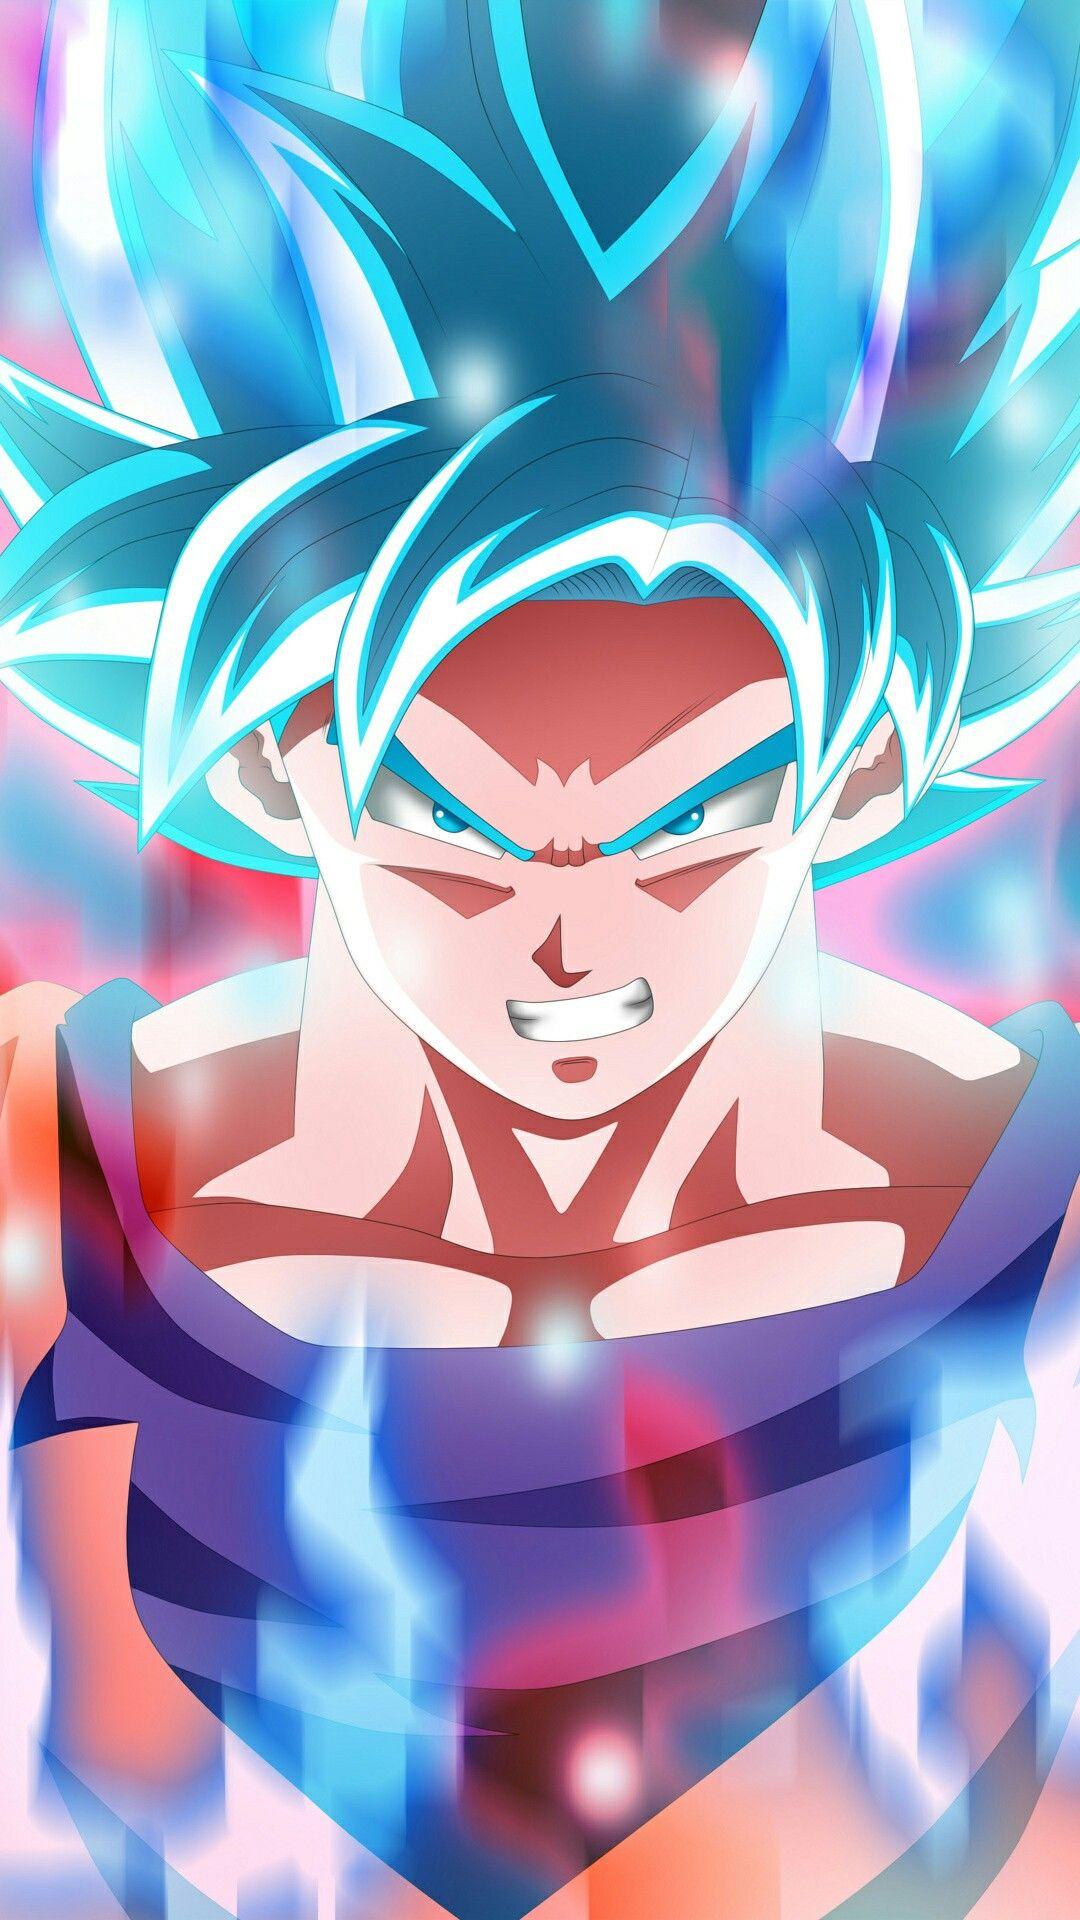 Goku SSBSS Visit now for 3D Dragon Ball Z compression